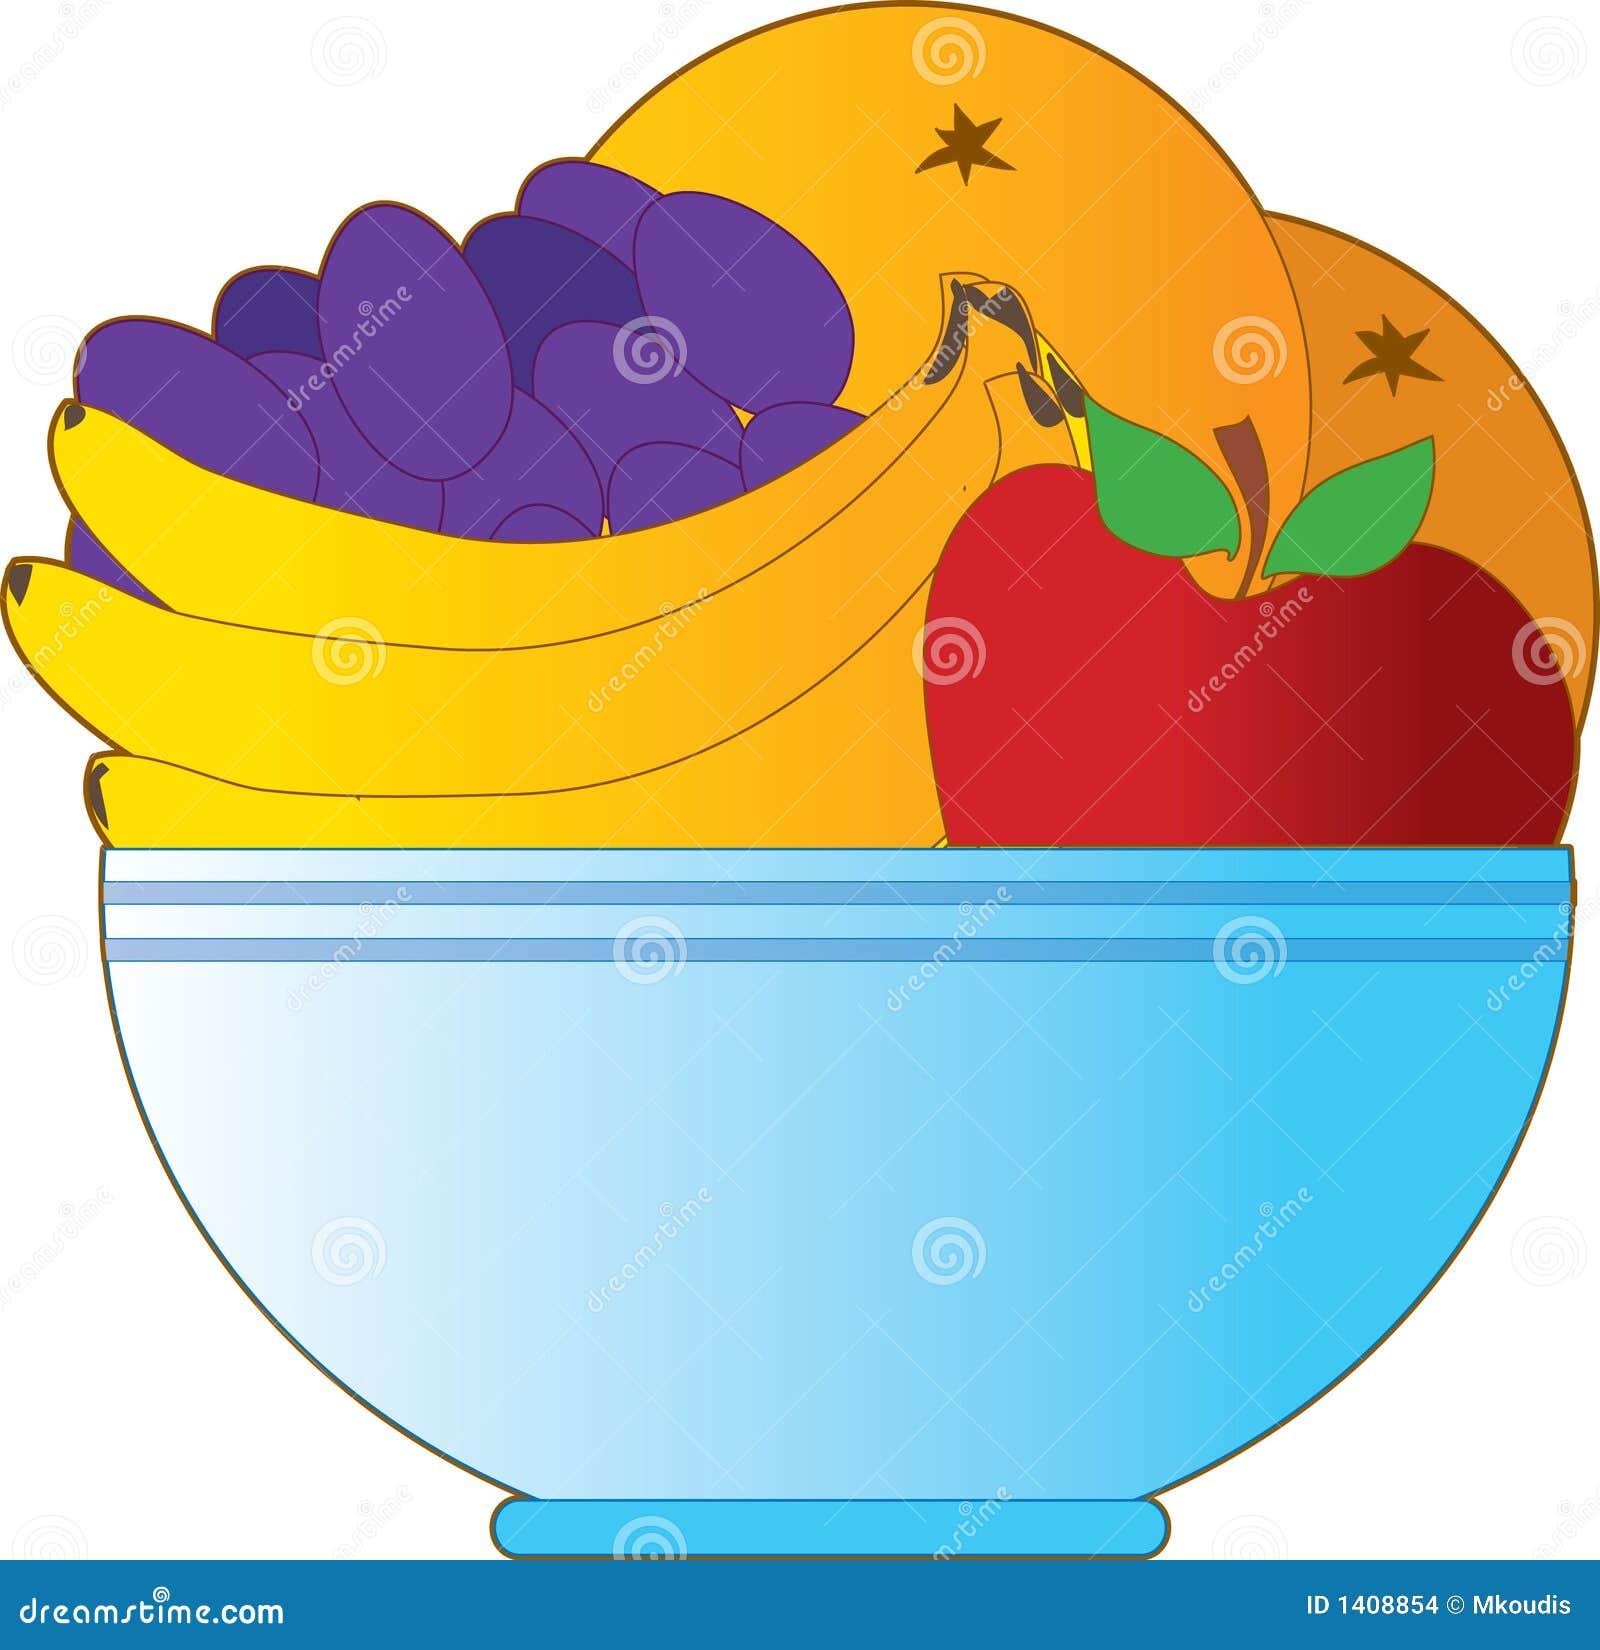 Fruit Bowl Stock Images - Image: 1408854